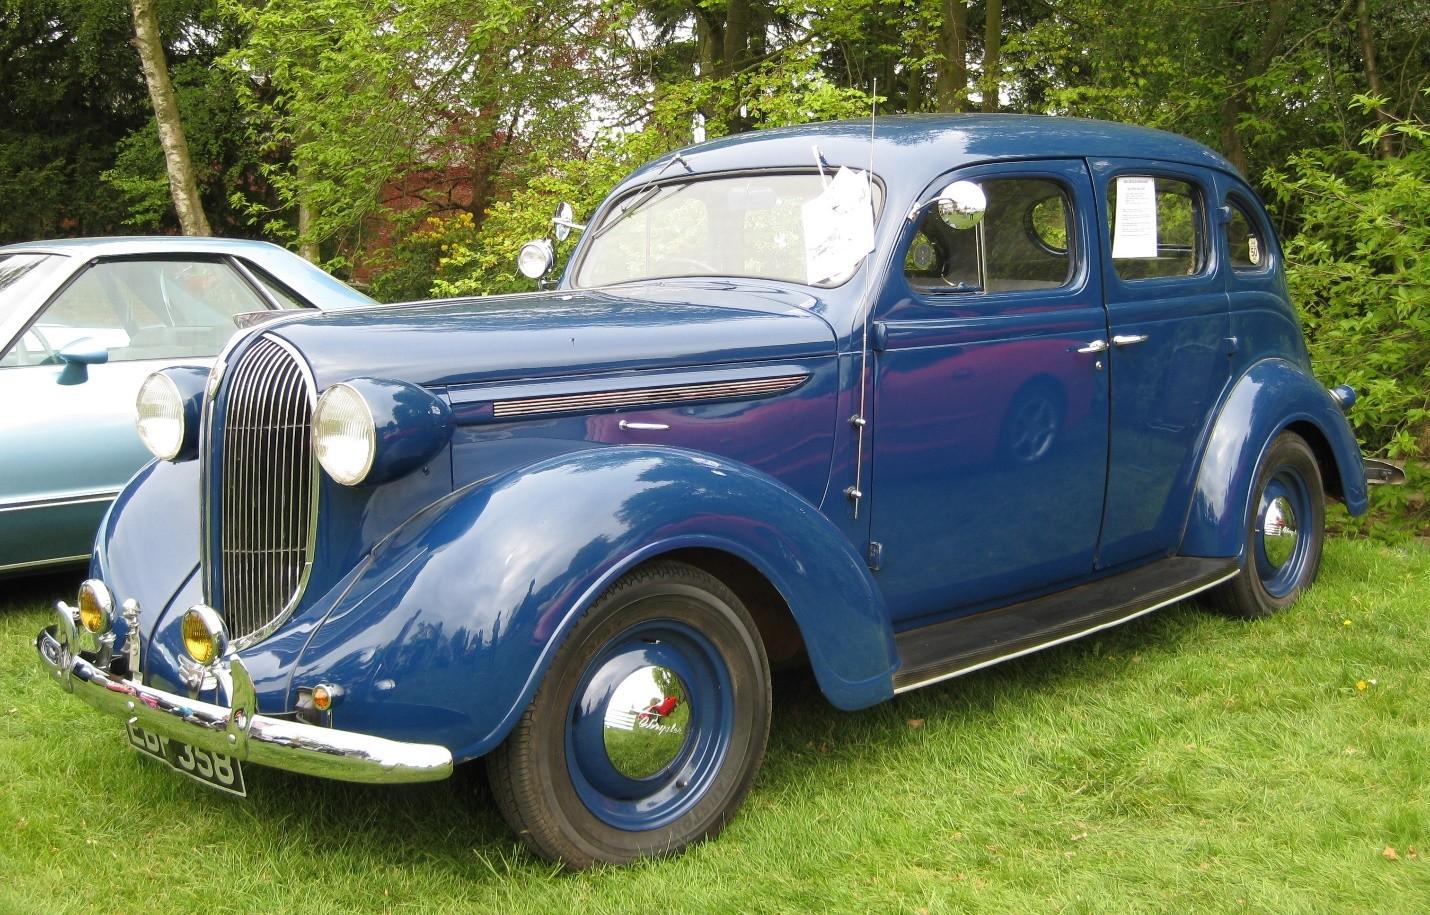 Bringing Classic Cars to Europe